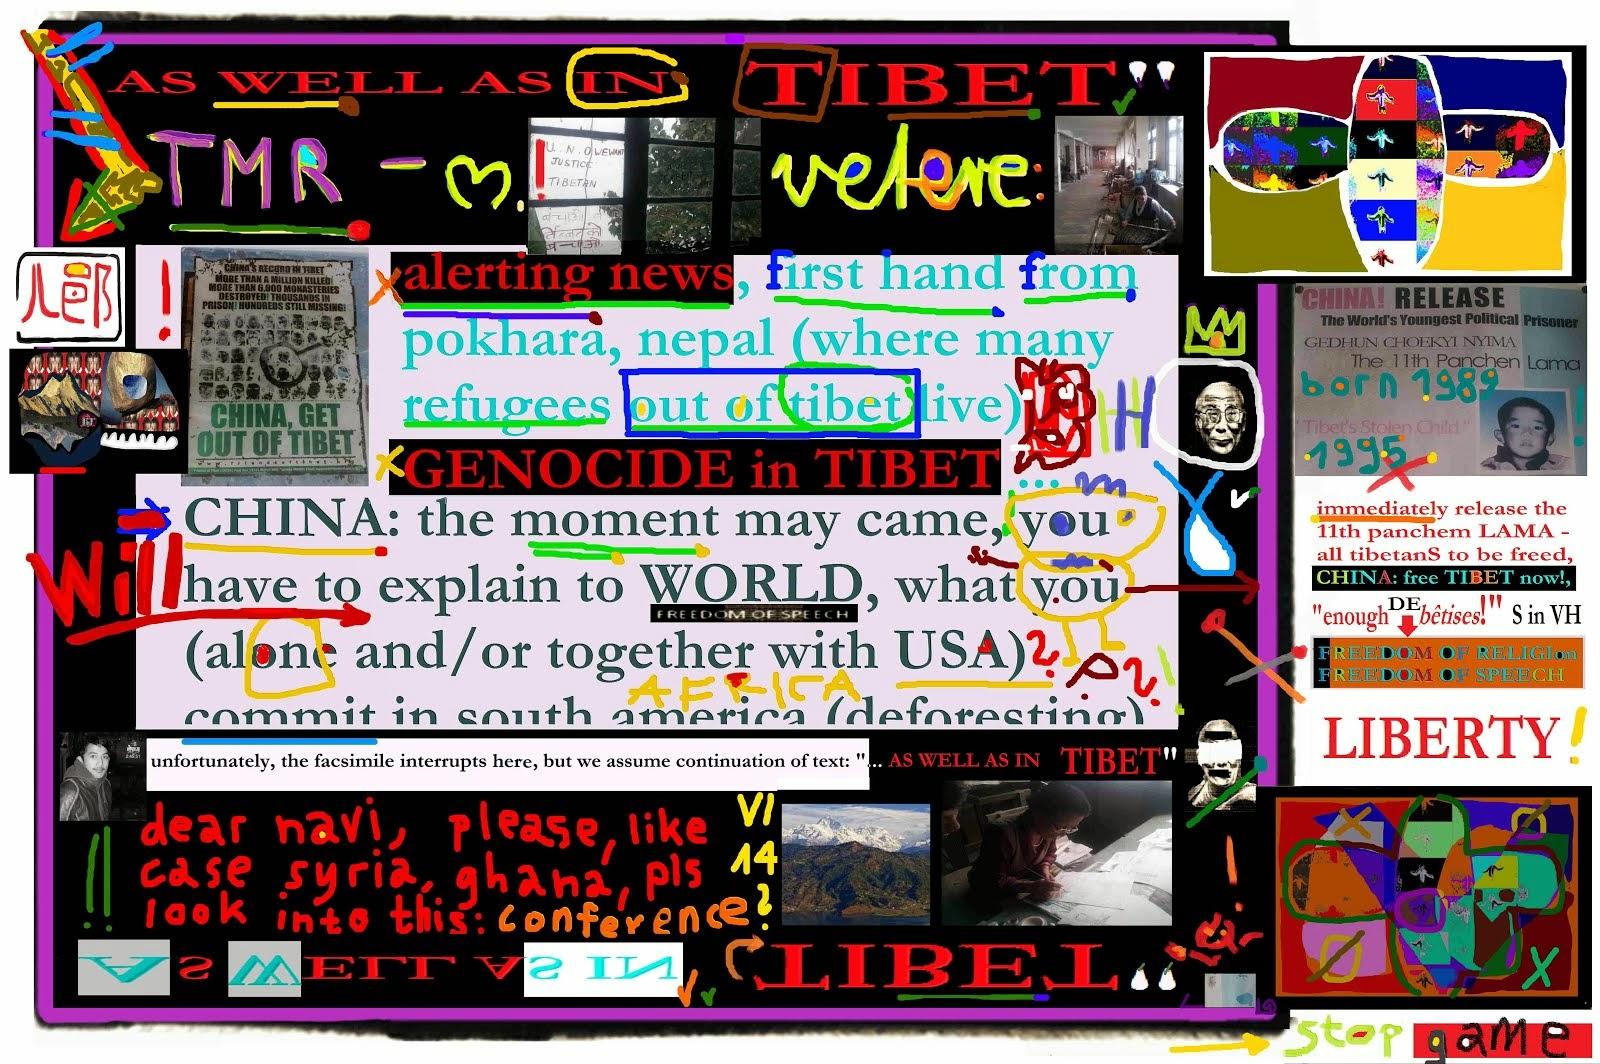 GENOCIDE in TIBET NAVI PILAY UN USA CHINA dalai lama 11th panchem lama mischa vetere LIBERTY